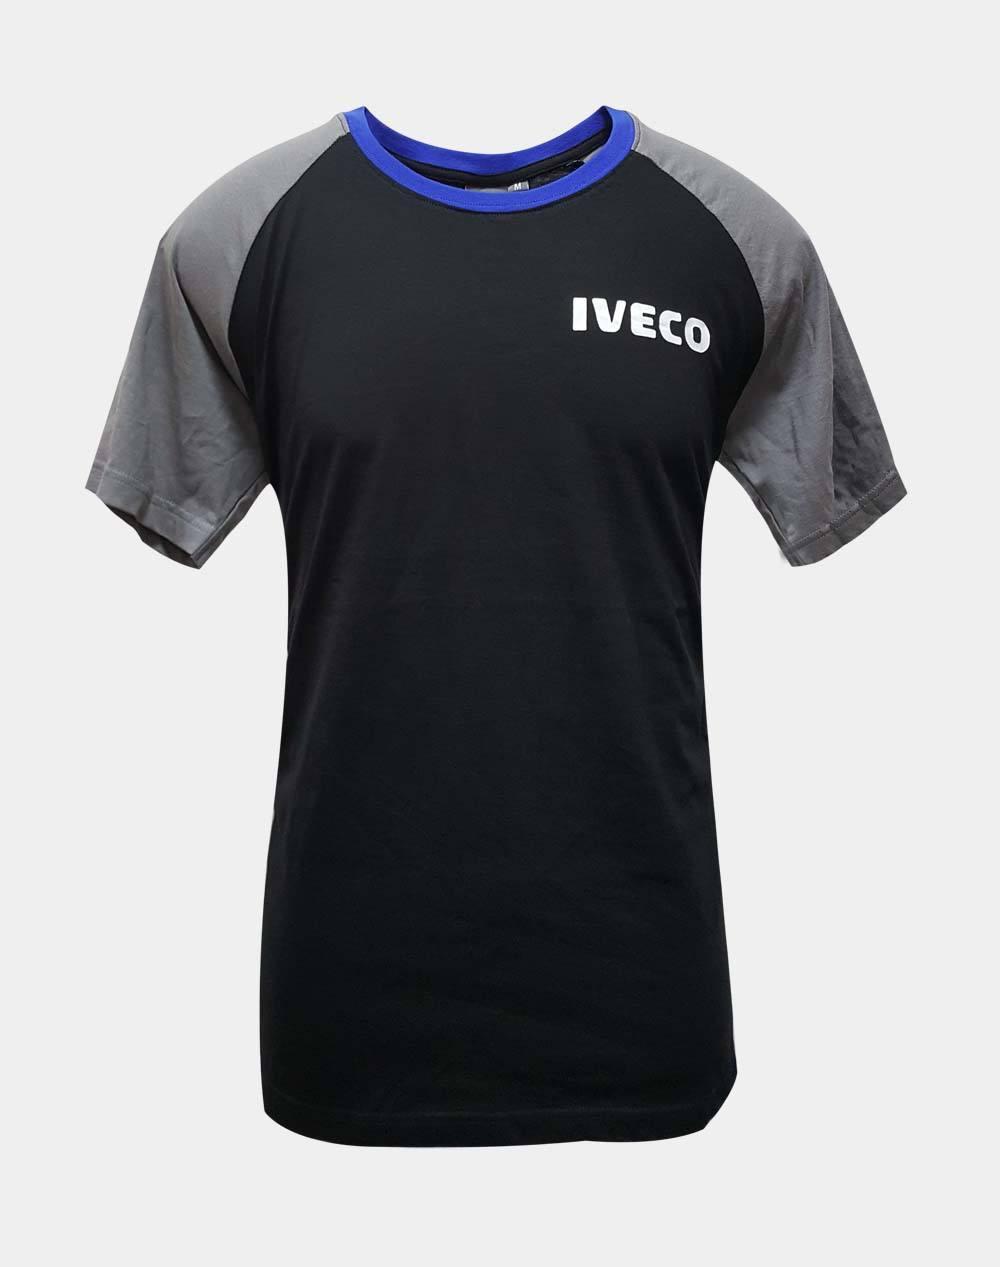 Raglan Sleeve T-shirt Manufacturer, Wholesale Raglan Sleeve T-shirt Supplier, Bangladesh, Manufacturer, Supplier, Exporter